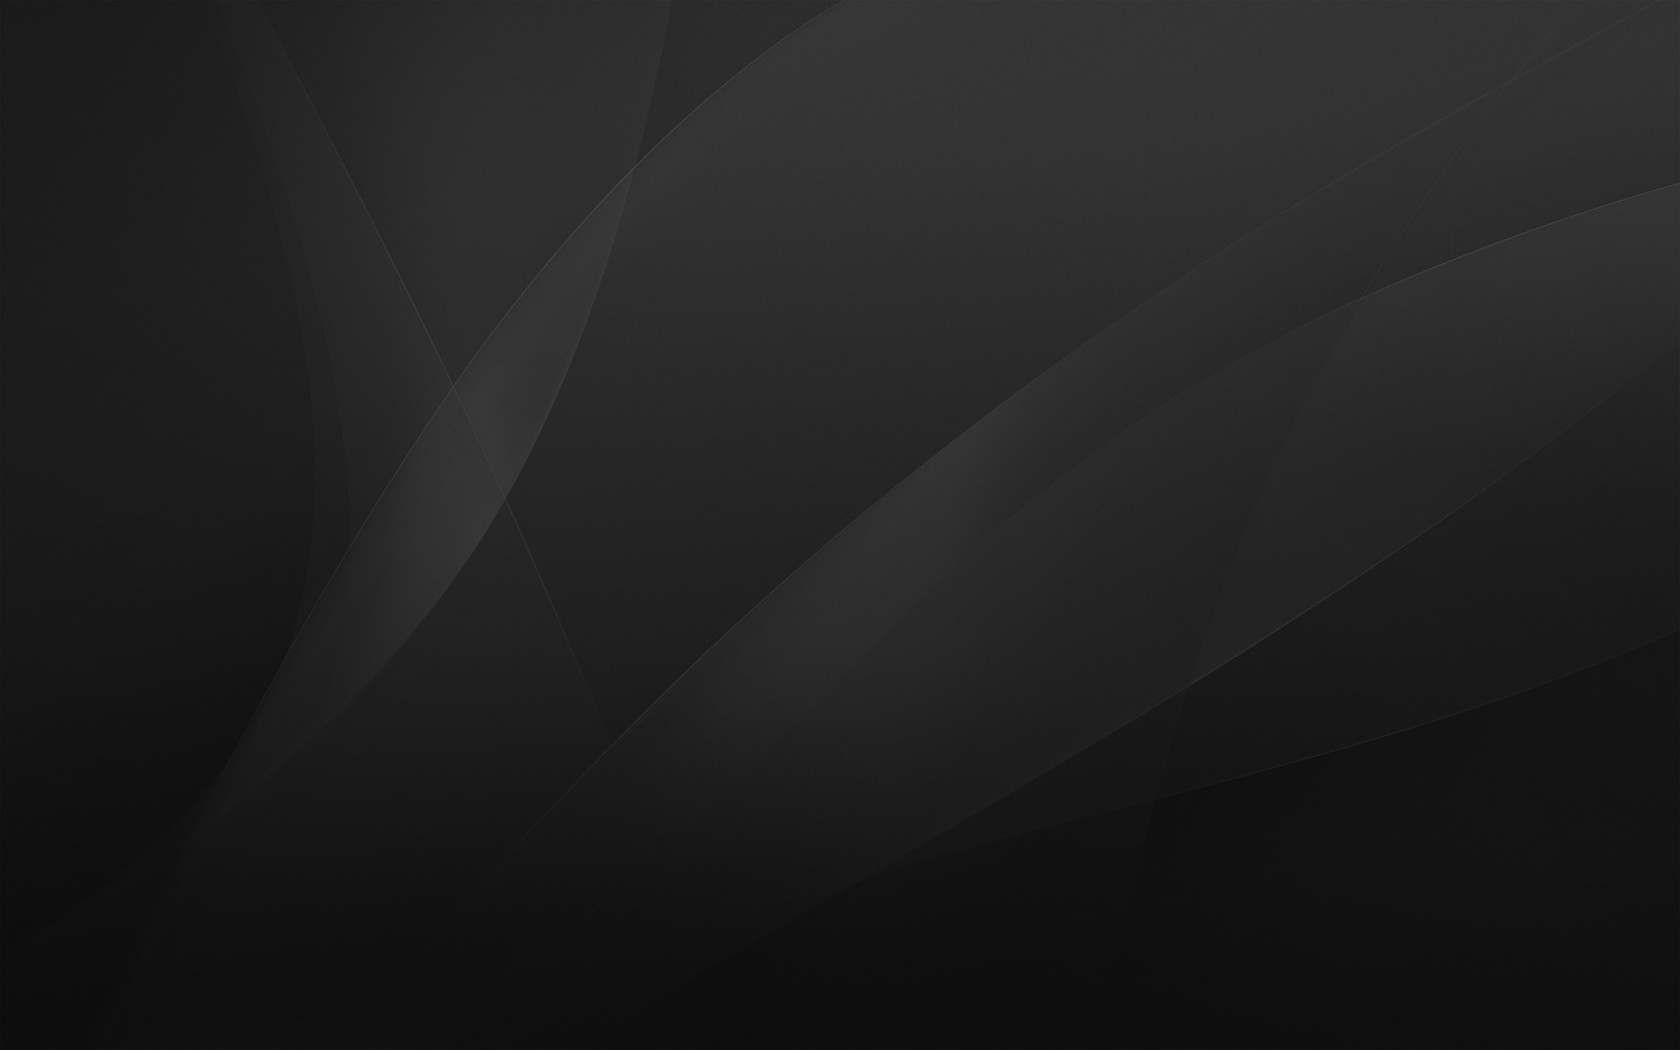 General 1680x1050 black texture monochrome minimalism